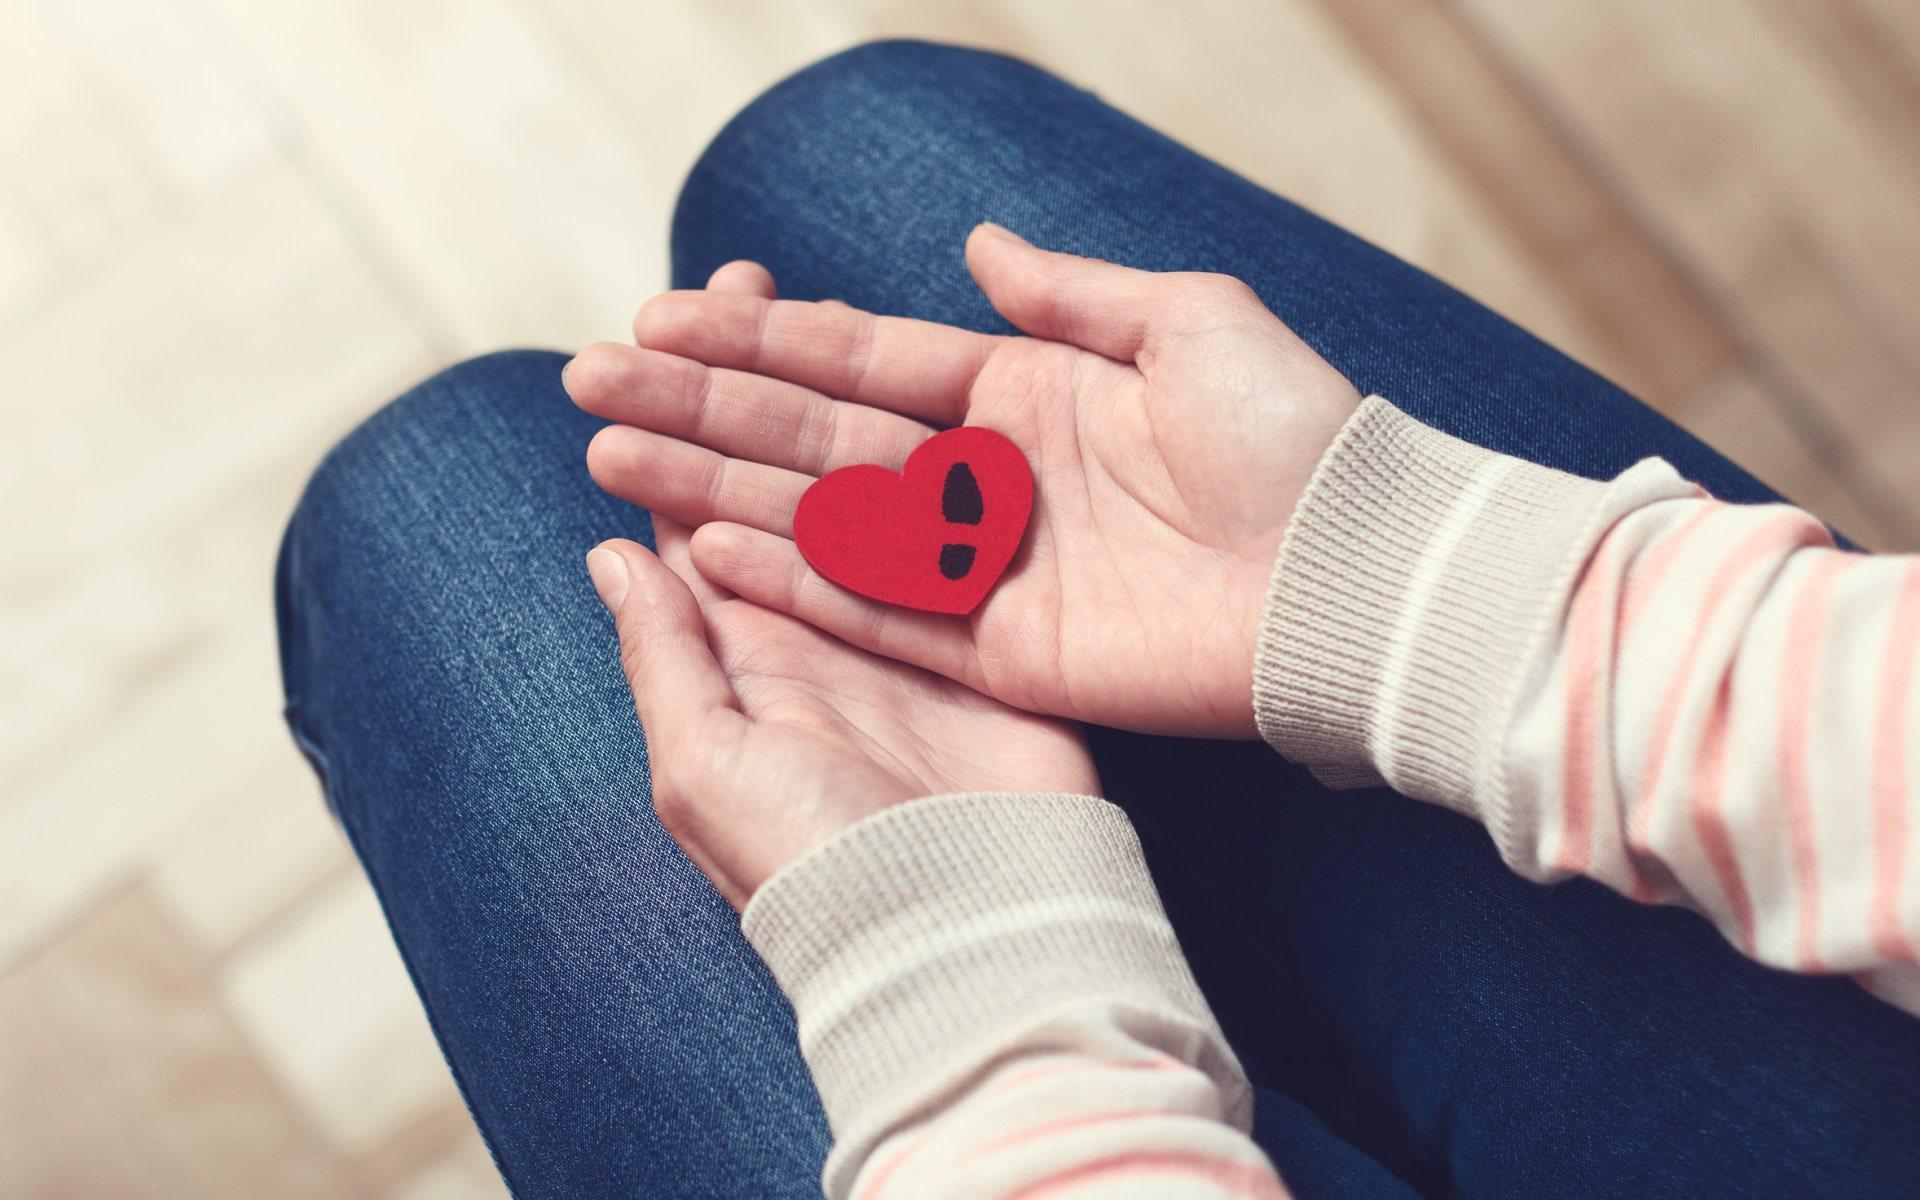 Обои сердце, шов, разбитое сердце, рисунок. Разное foto 16